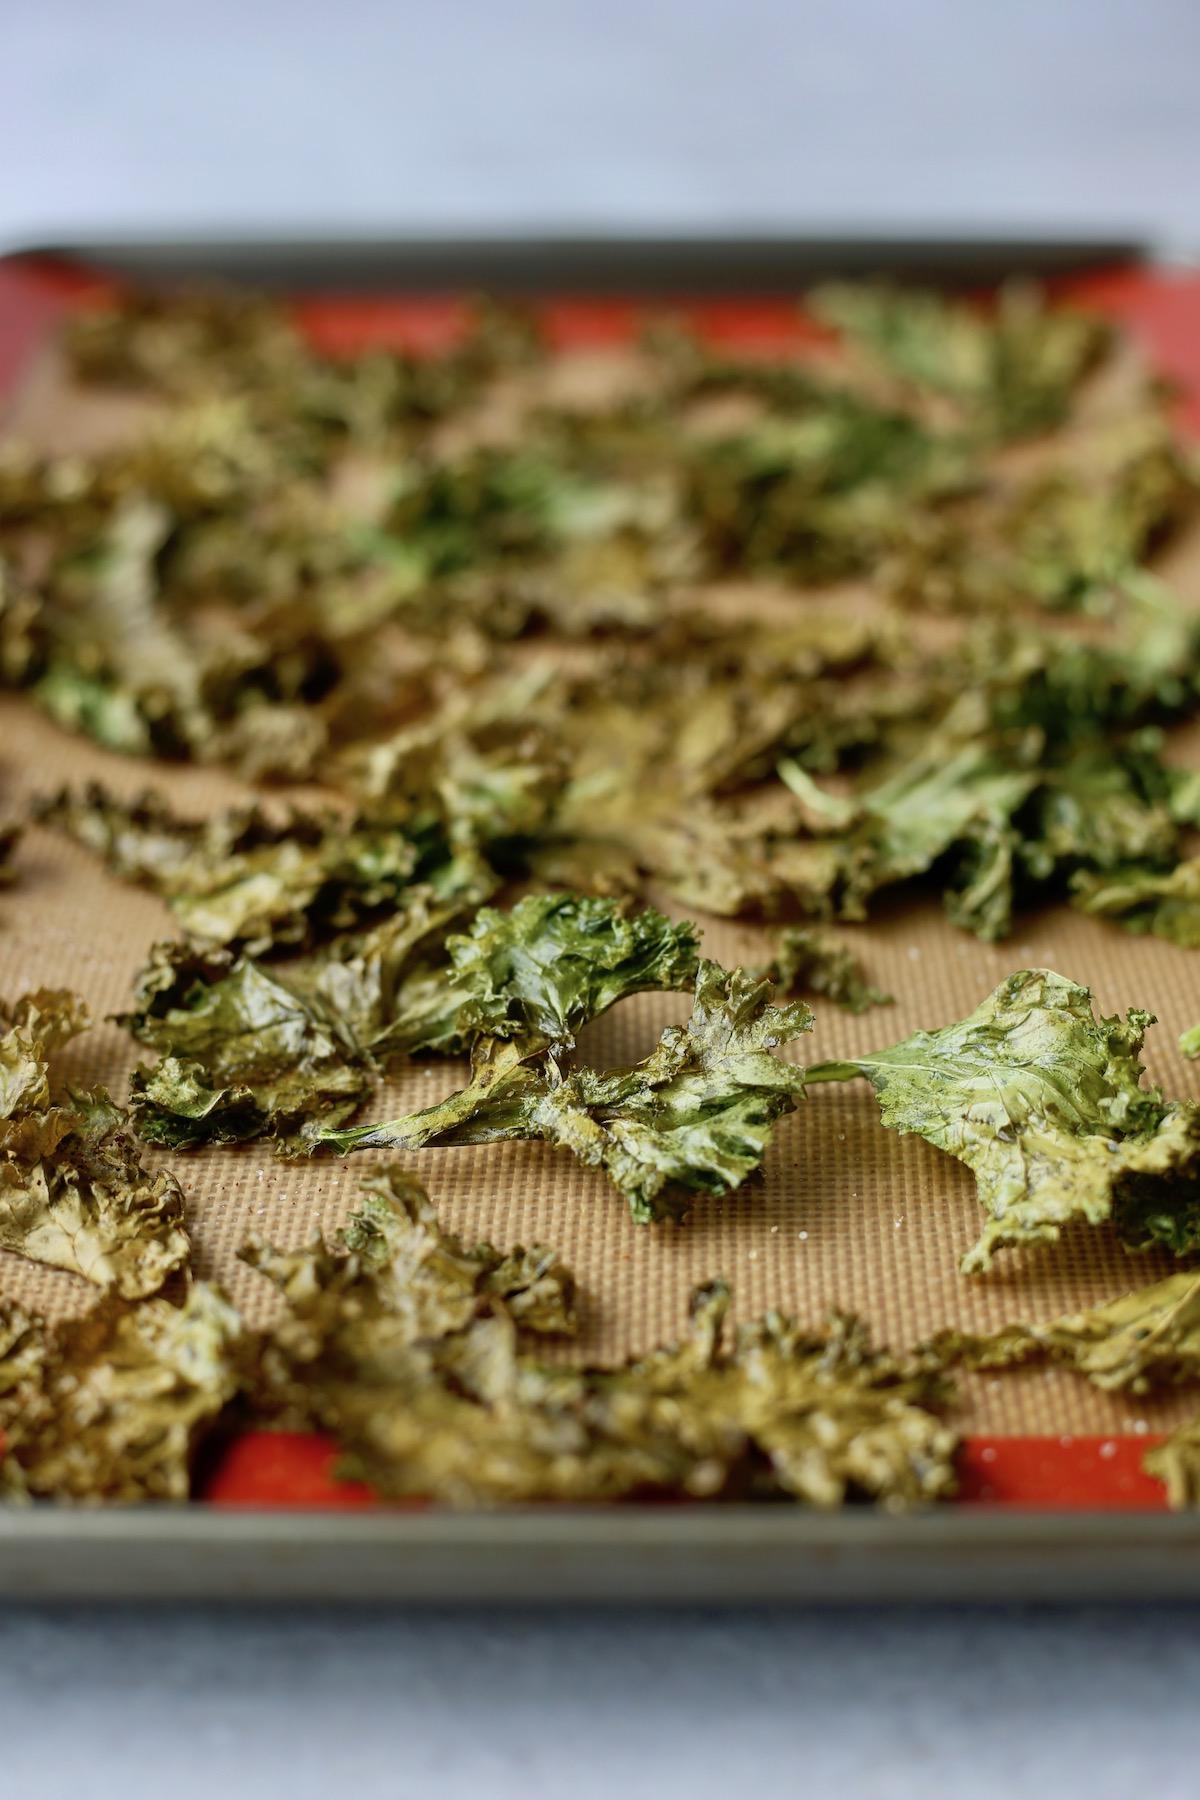 crispy kale chips on a baking sheet